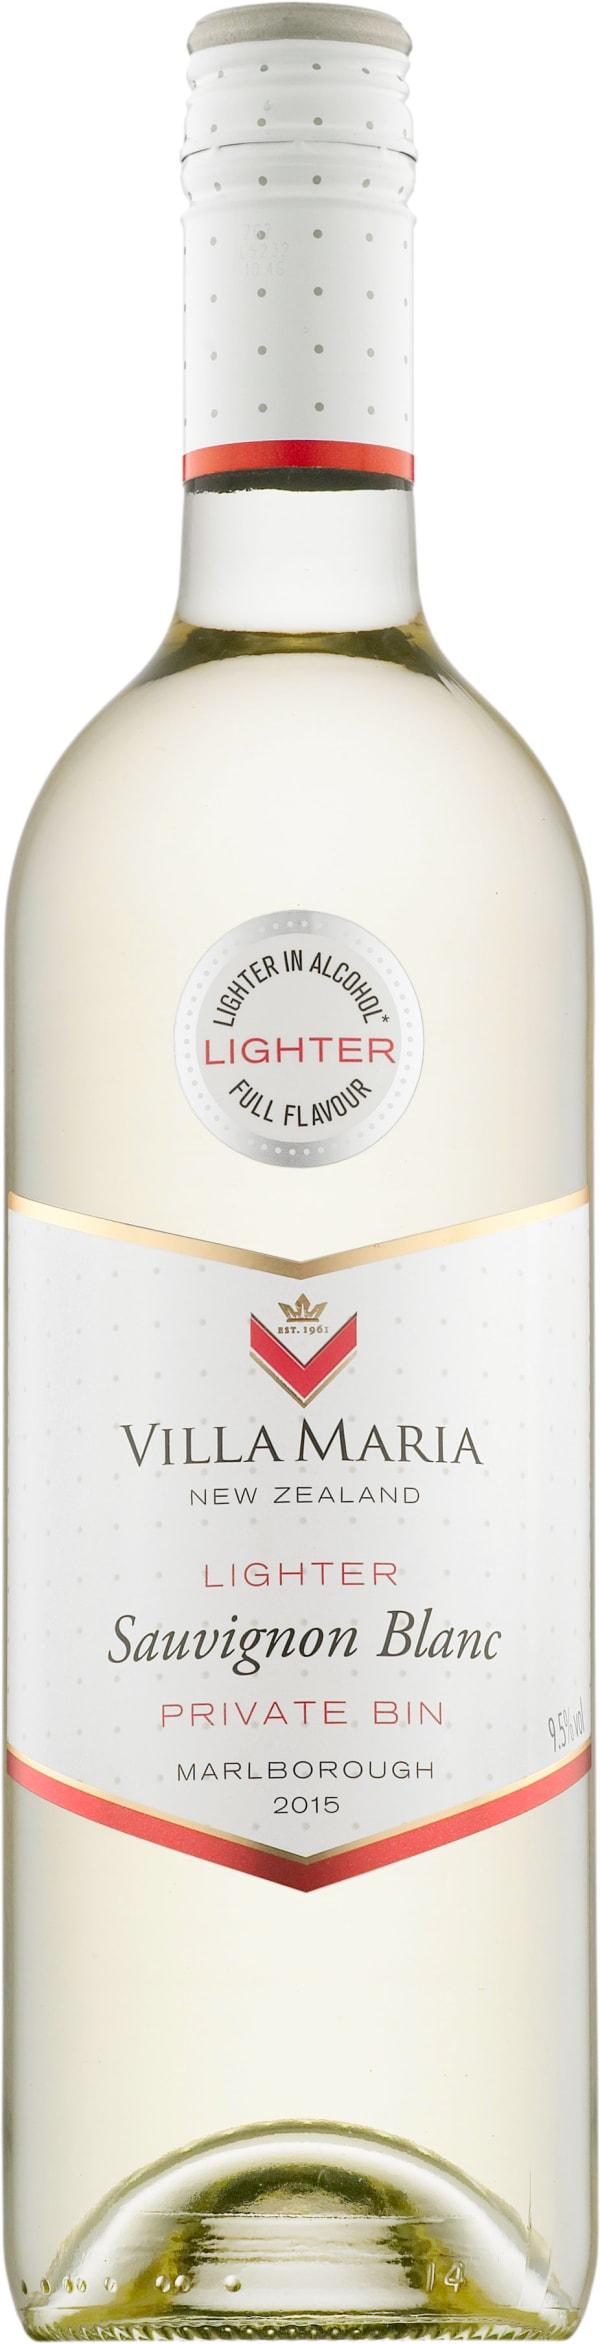 Villa Maria Lighter Sauvignon Blanc 2017